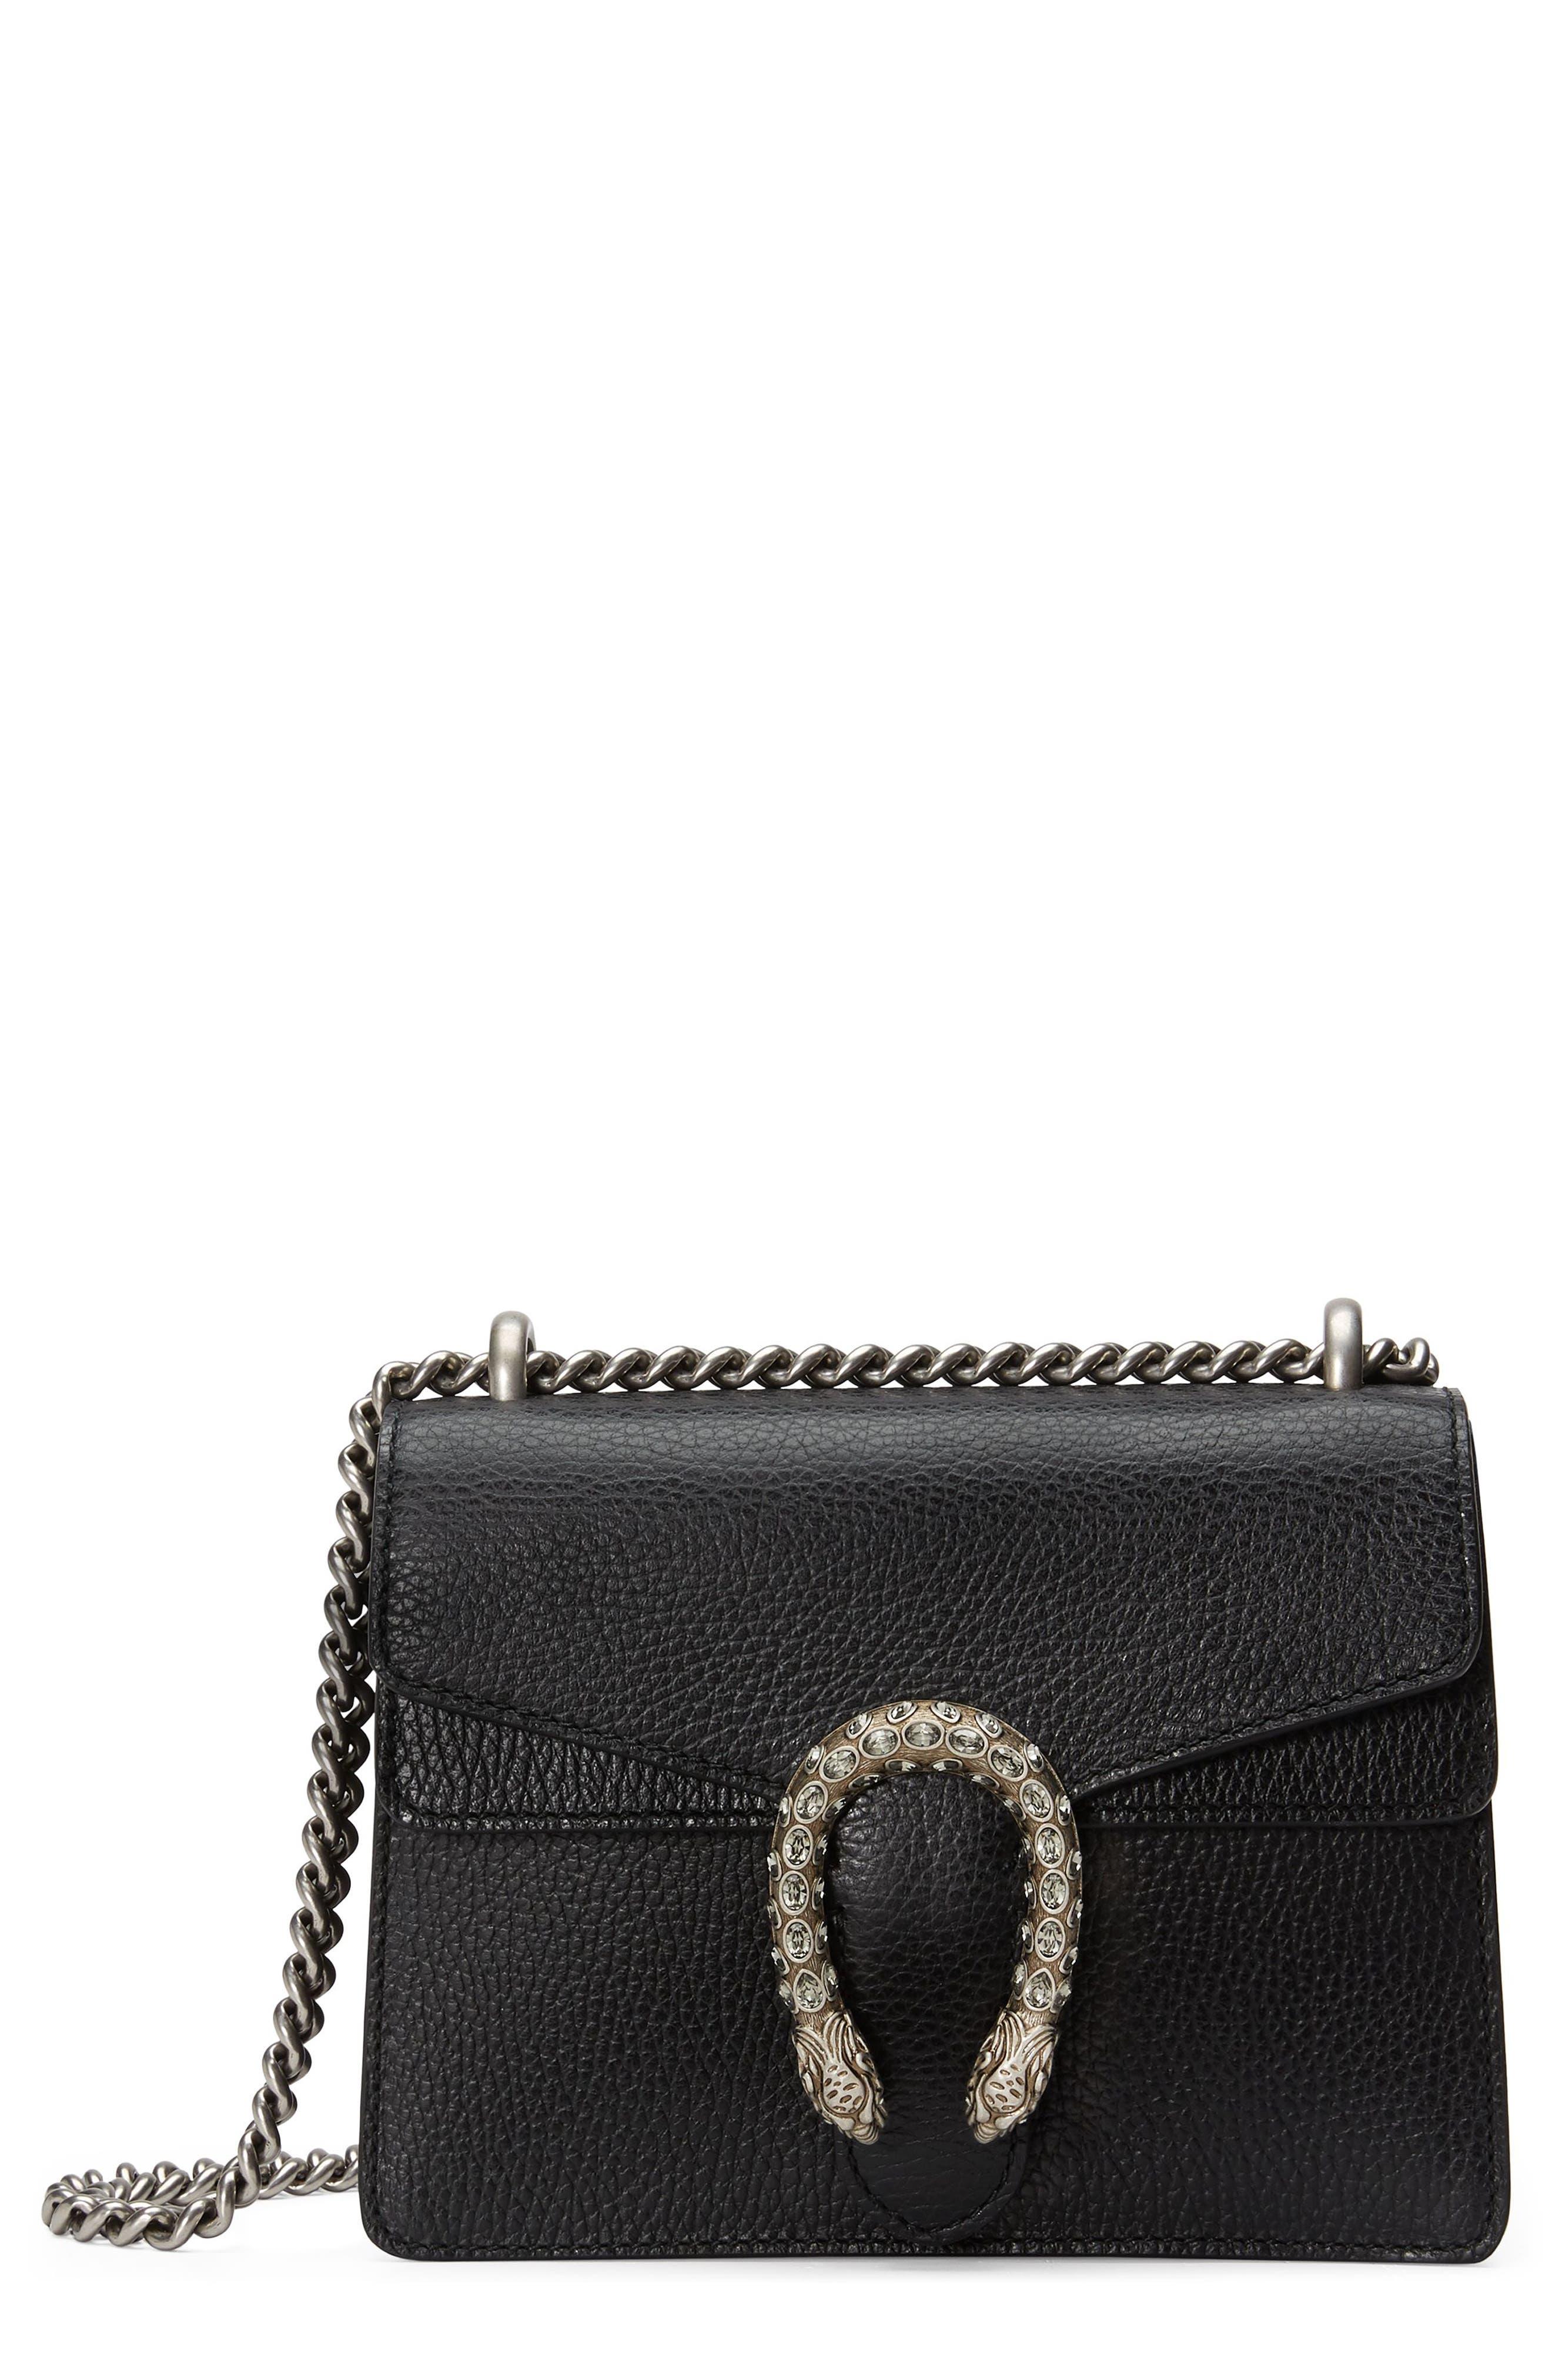 Mini Dionysus Leather Shoulder Bag,                         Main,                         color, NERO/ BLACK DIAMOND